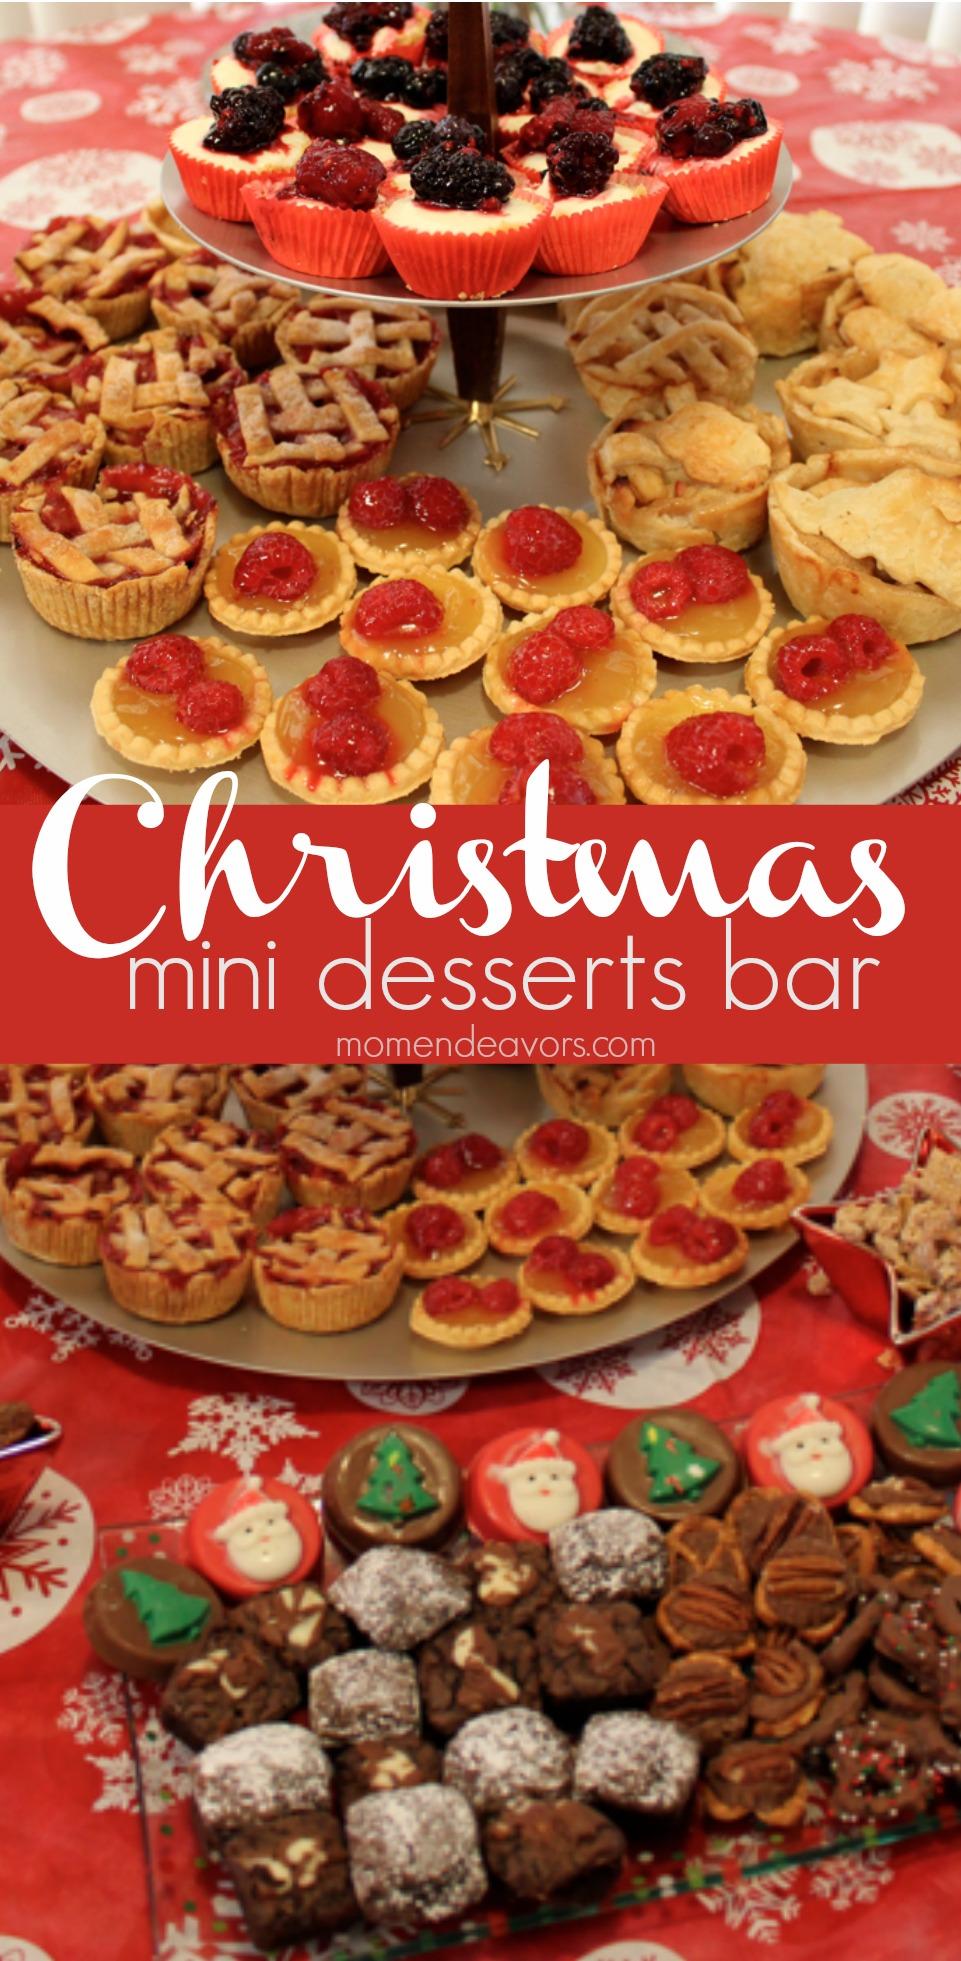 Christmas mini desserts bar